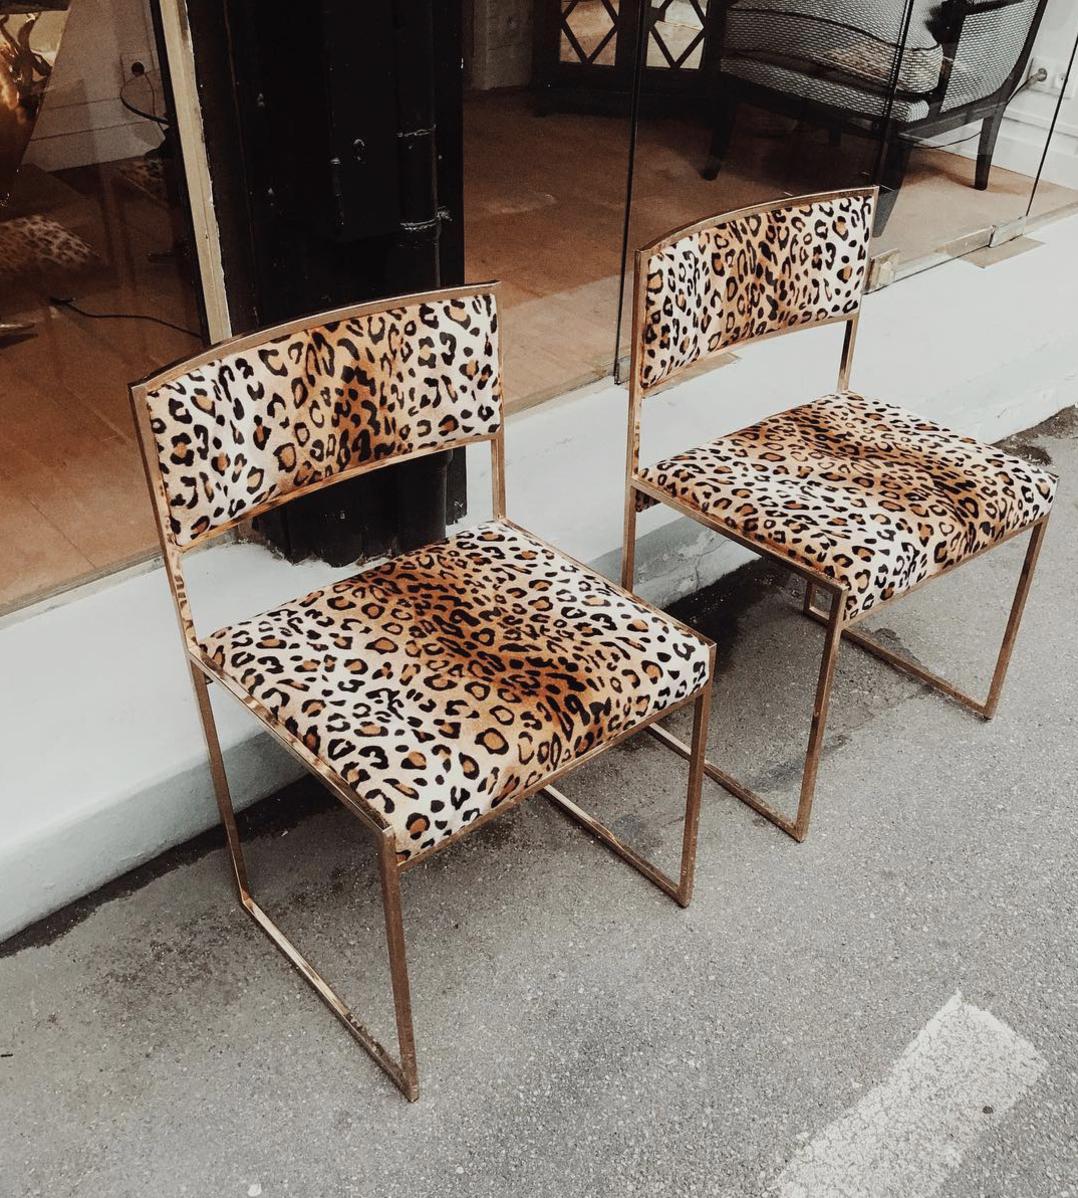 Leopard chairs, taken by Vivian Hoorn. | decor, inspiration, aesthetic, design | Allegory of Vanity